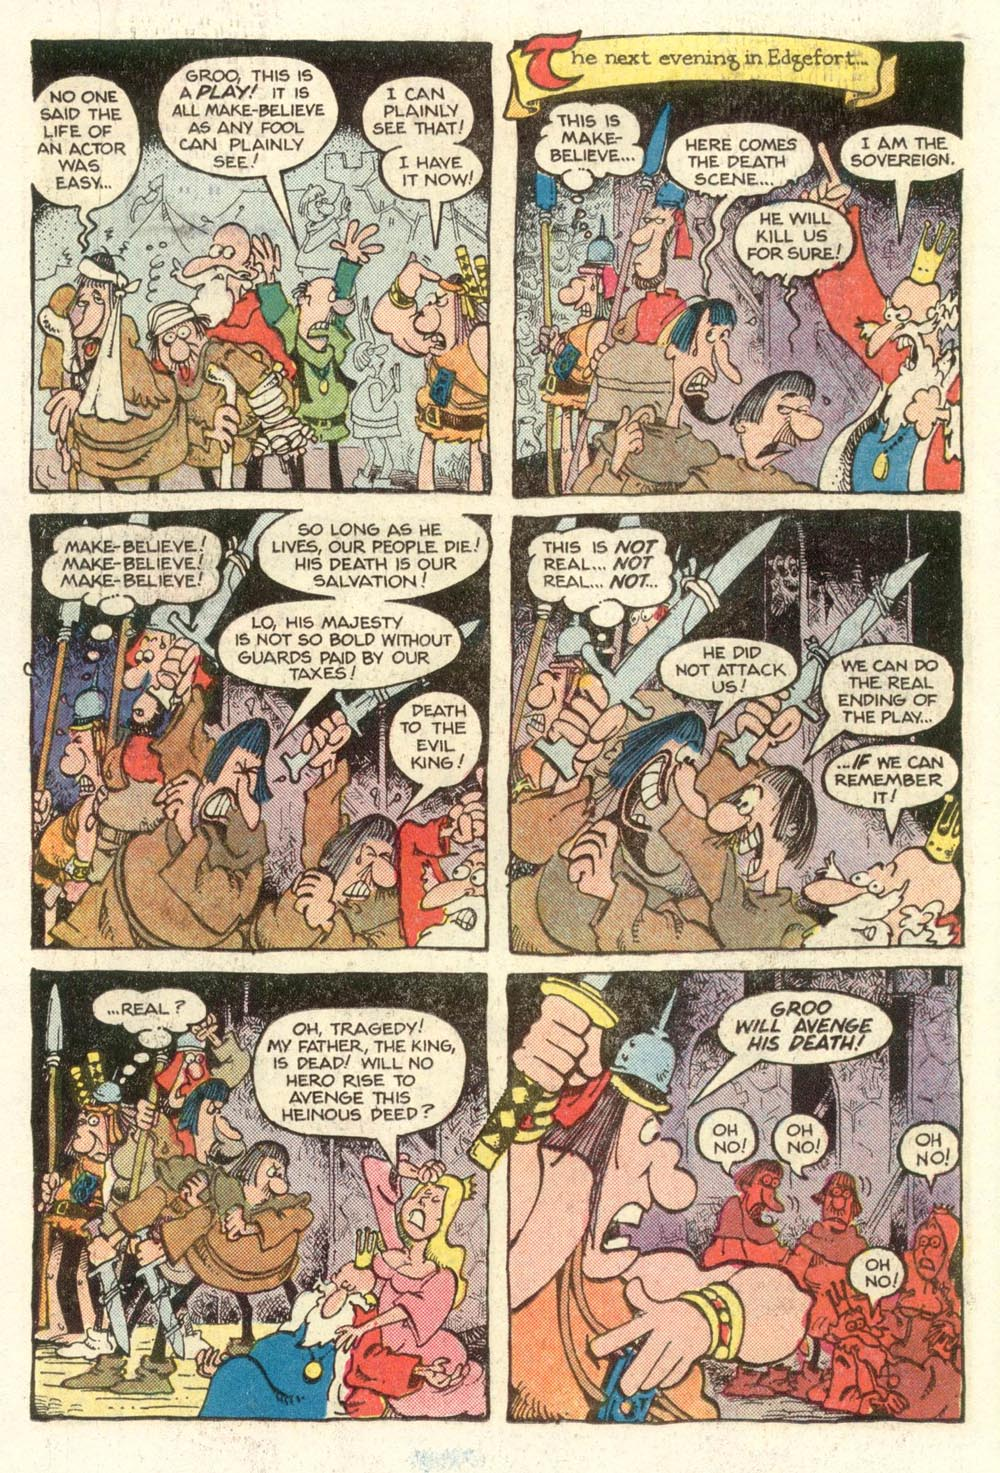 Read online Sergio Aragonés Groo the Wanderer comic -  Issue #12 - 13